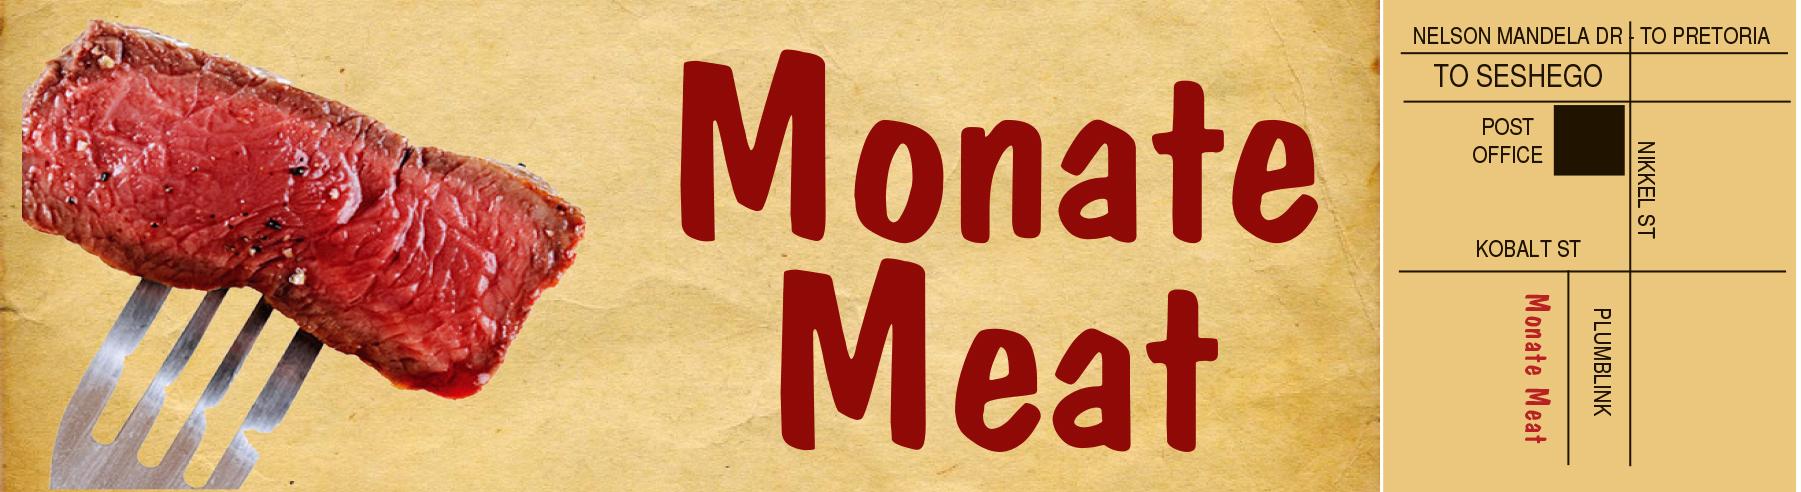 monate 1